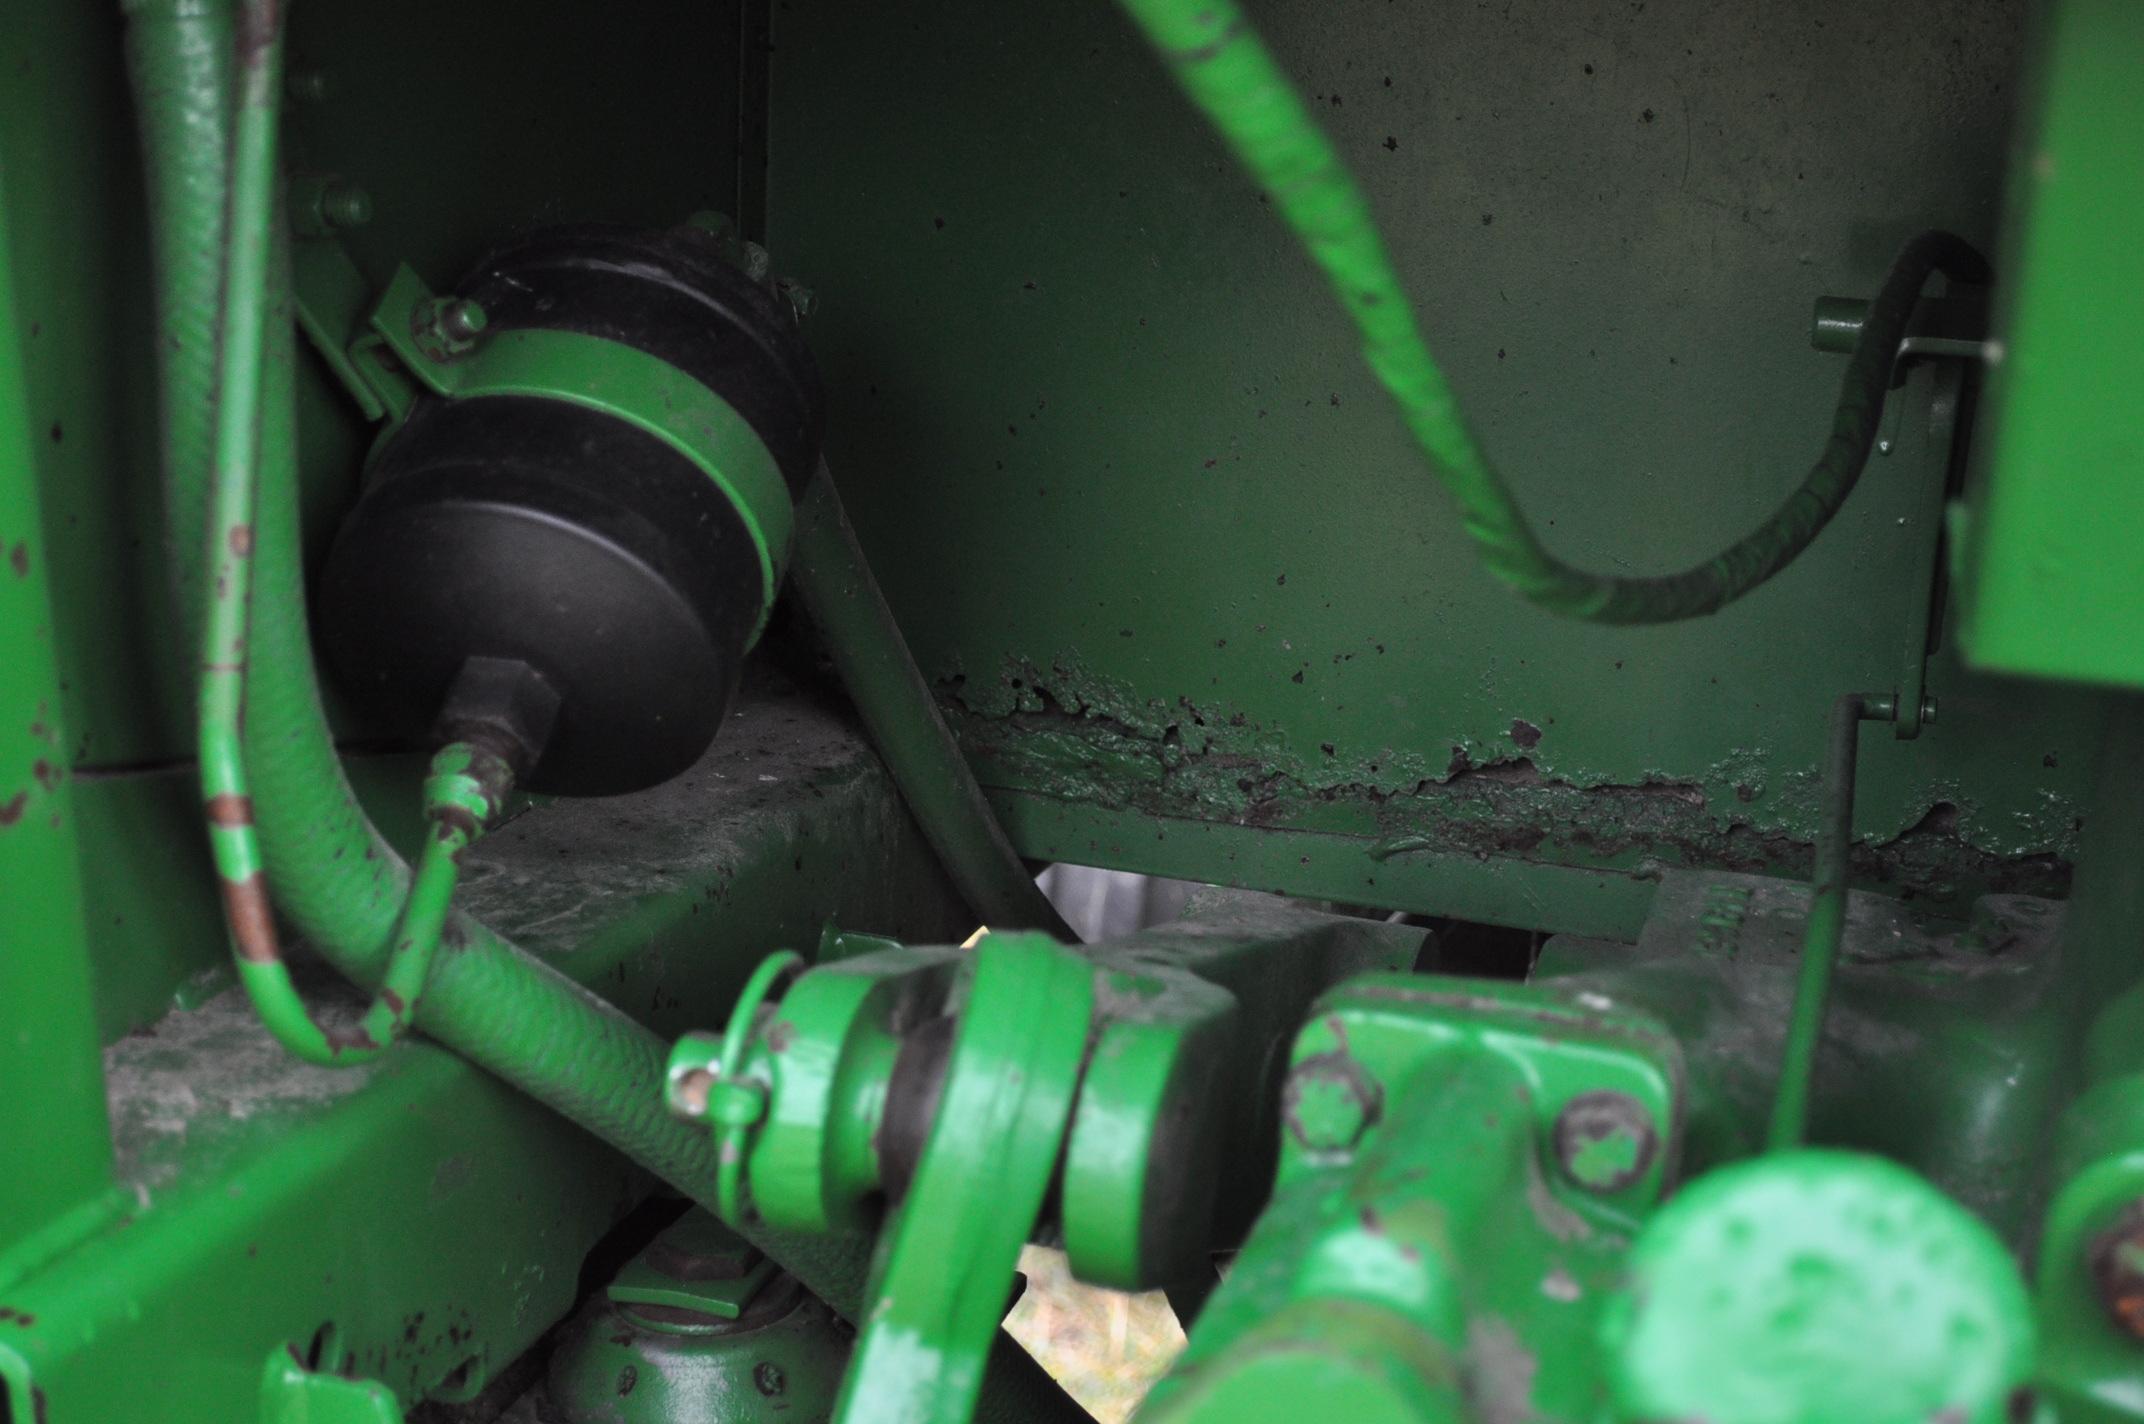 John Deere 4230 tractor, diesel, 18.4-34 hub duals, 10.00-16 front, CHA, Quad range, 2 hyd - Image 18 of 23